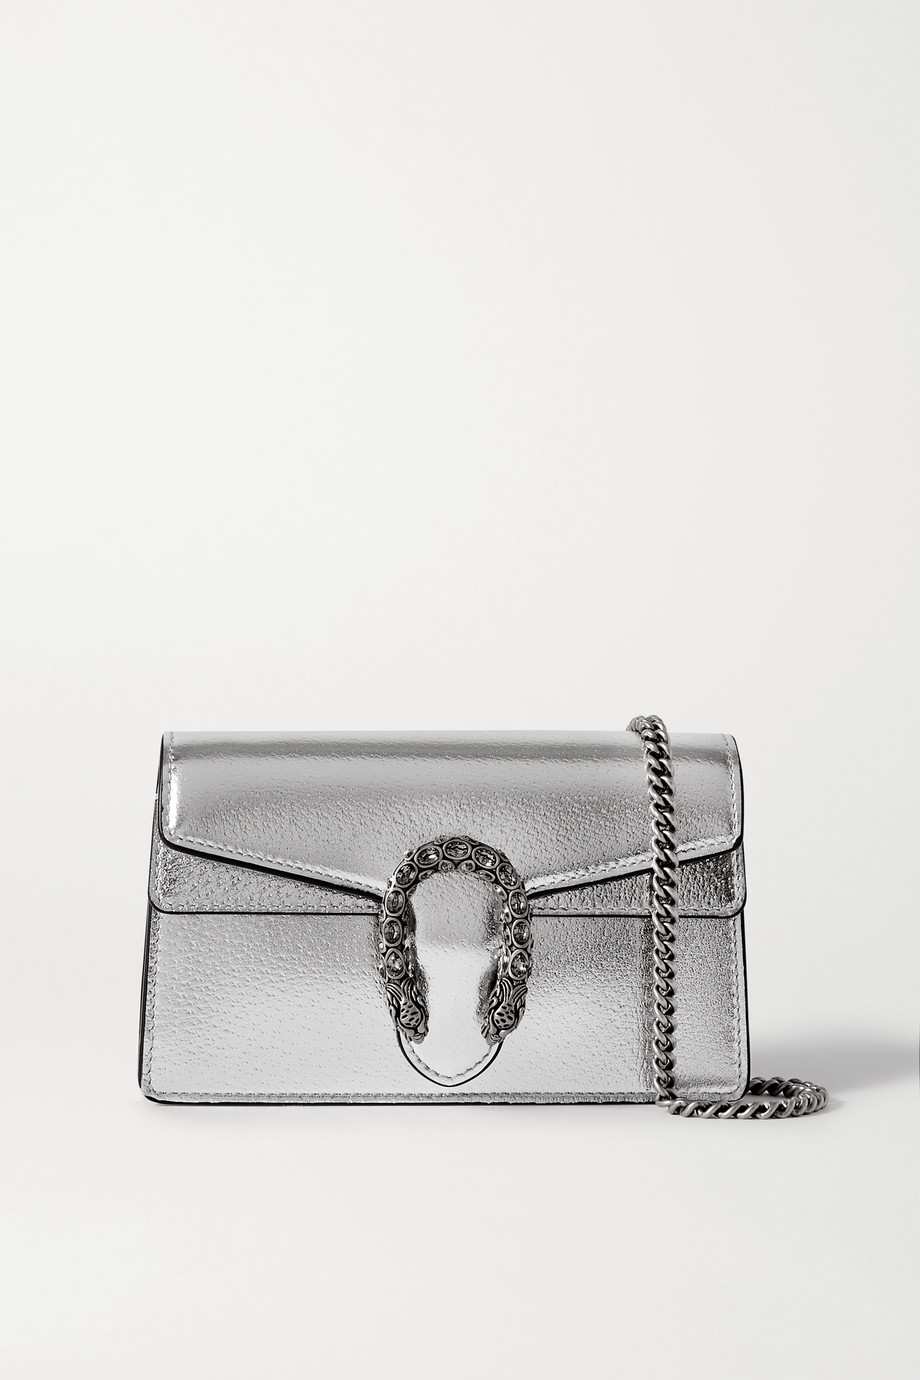 Gucci Dionysus super mini Schultertasche aus Metallic-Leder